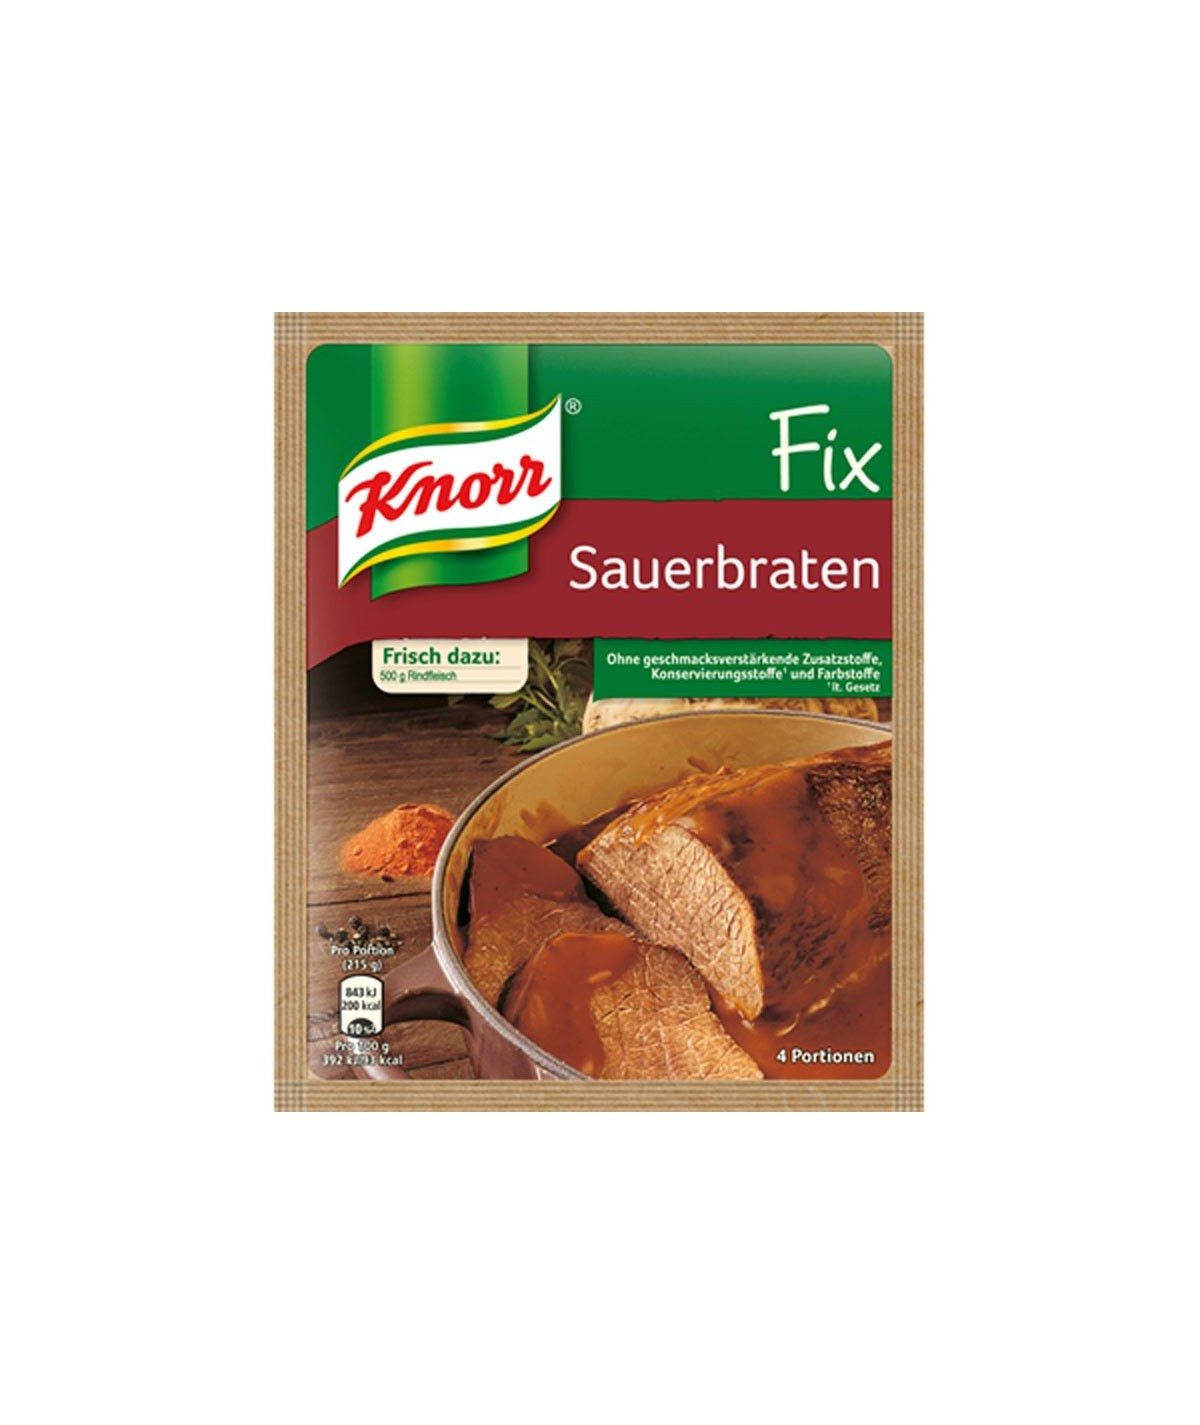 Knorr Fix Sauerbraten 37 g